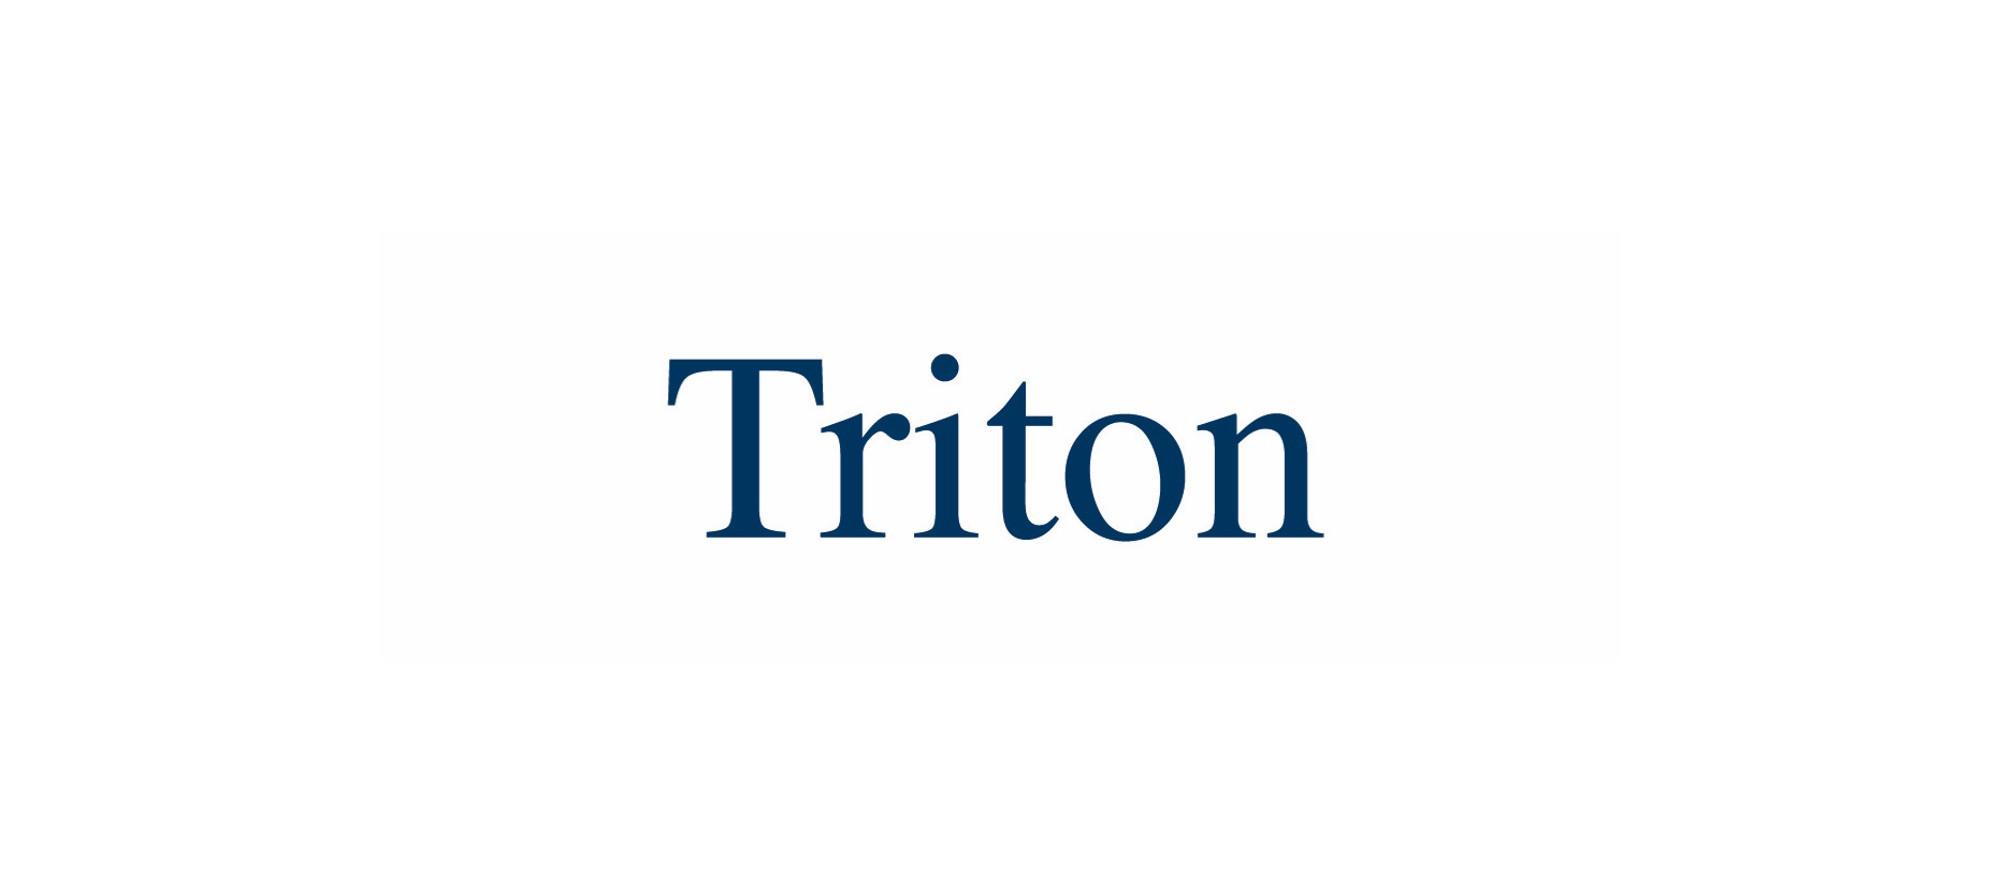 Triton.jpeg